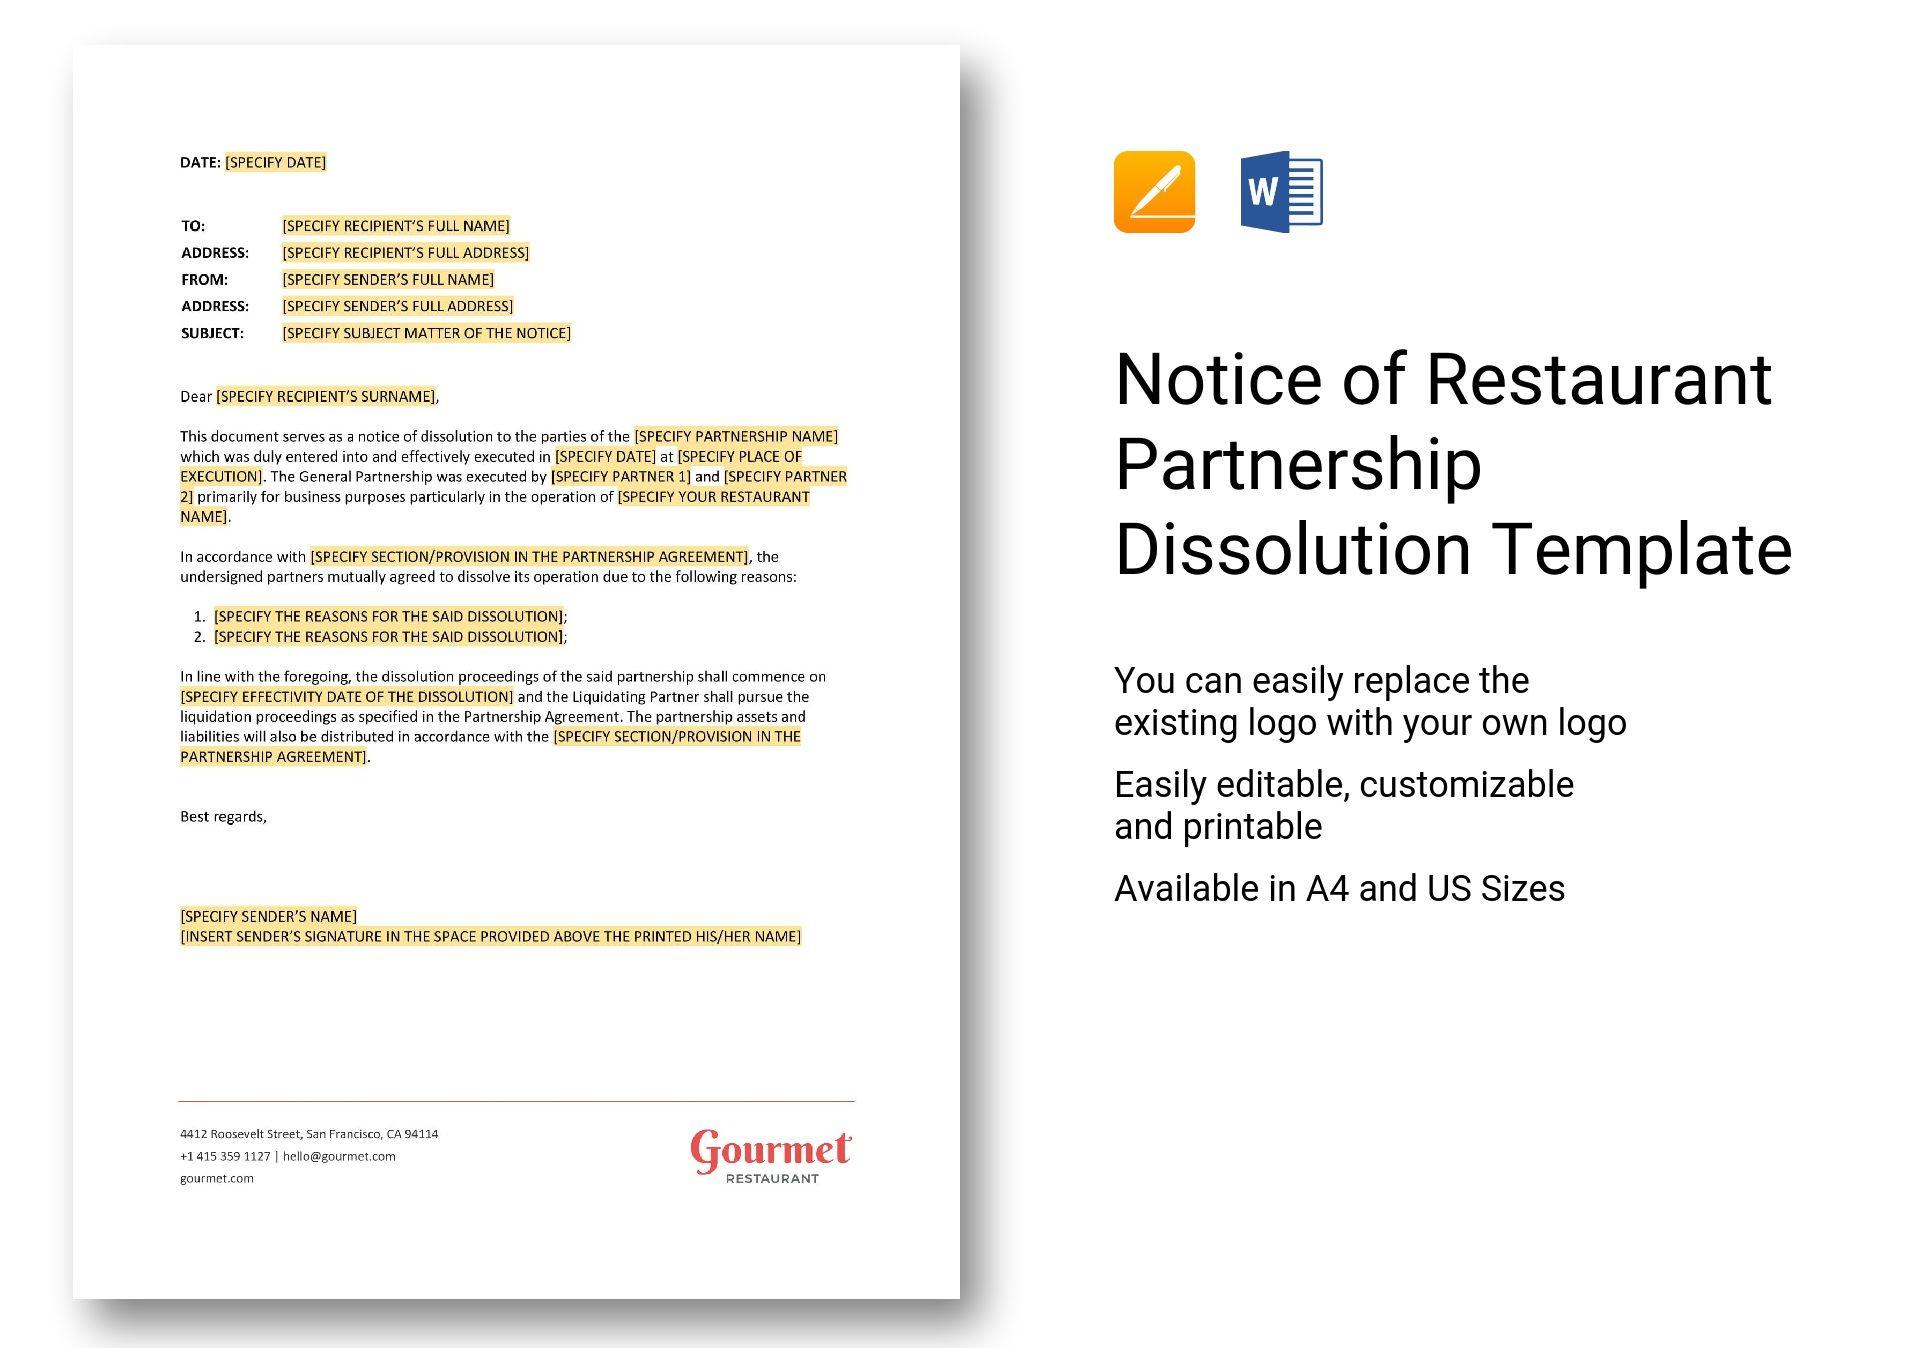 notice of restaurant partnership dissolution